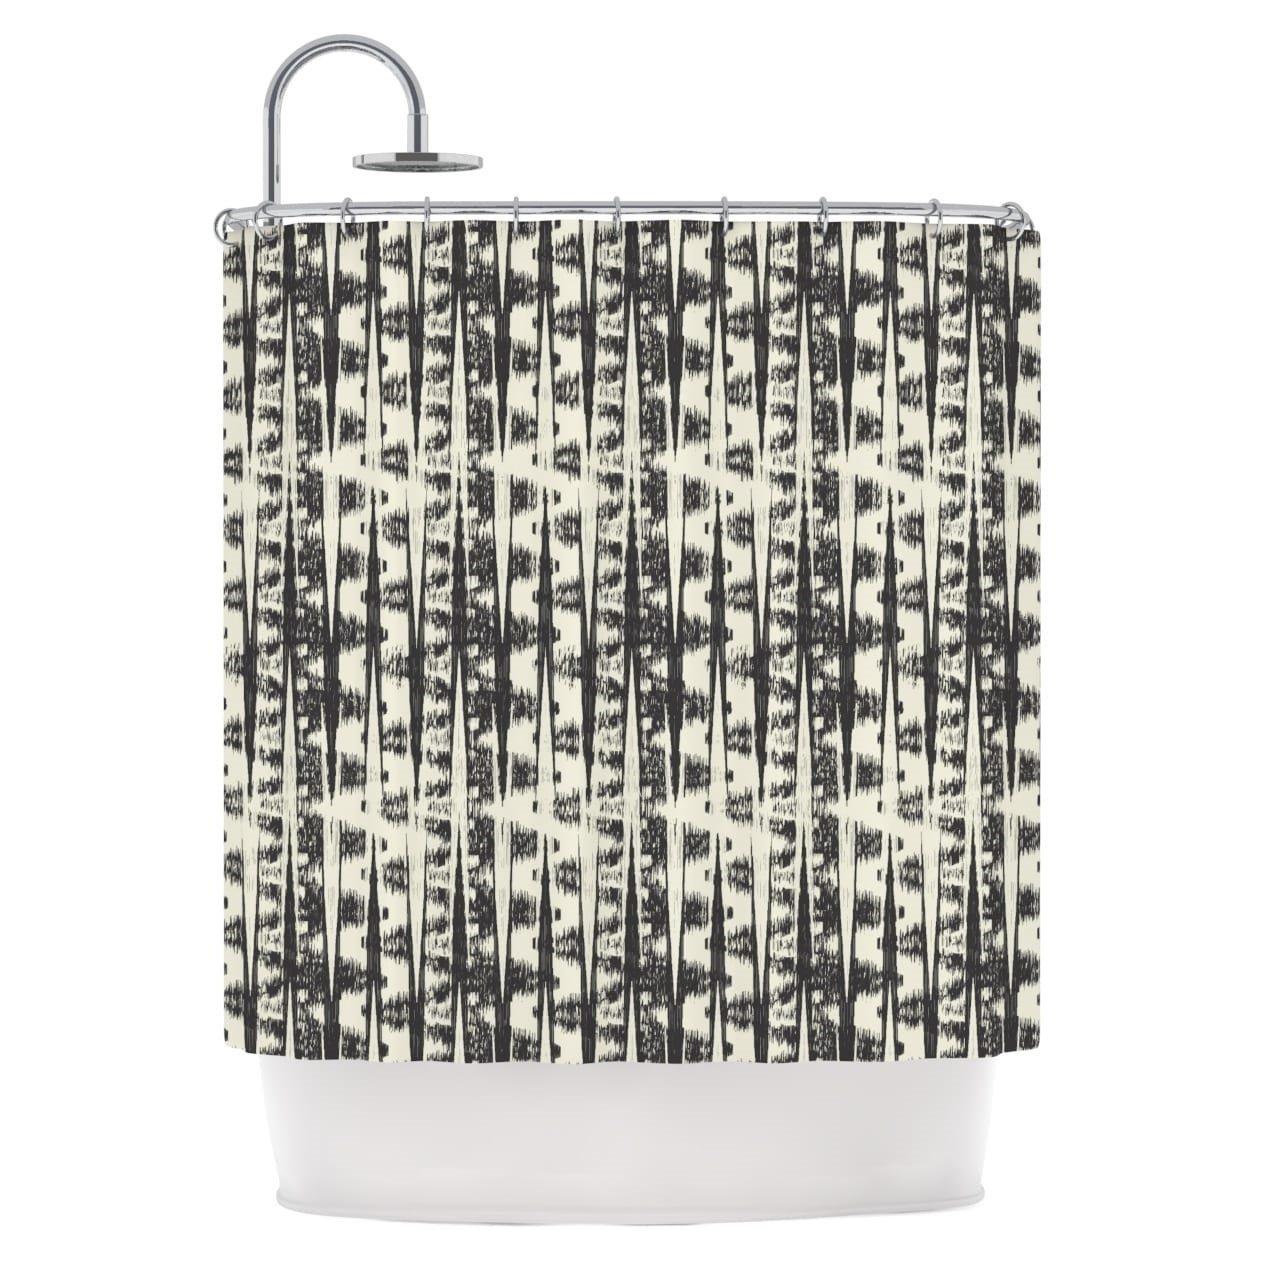 Geometric Stripes Chevron Pattern, Elegant Top Shower Curtain, Printed Exotic Zigzag Classic Striped Herringbone Motif, Premium Modern Home Adults Kids Bathroom Decoration, Grey, Cream, Size 69 x 70